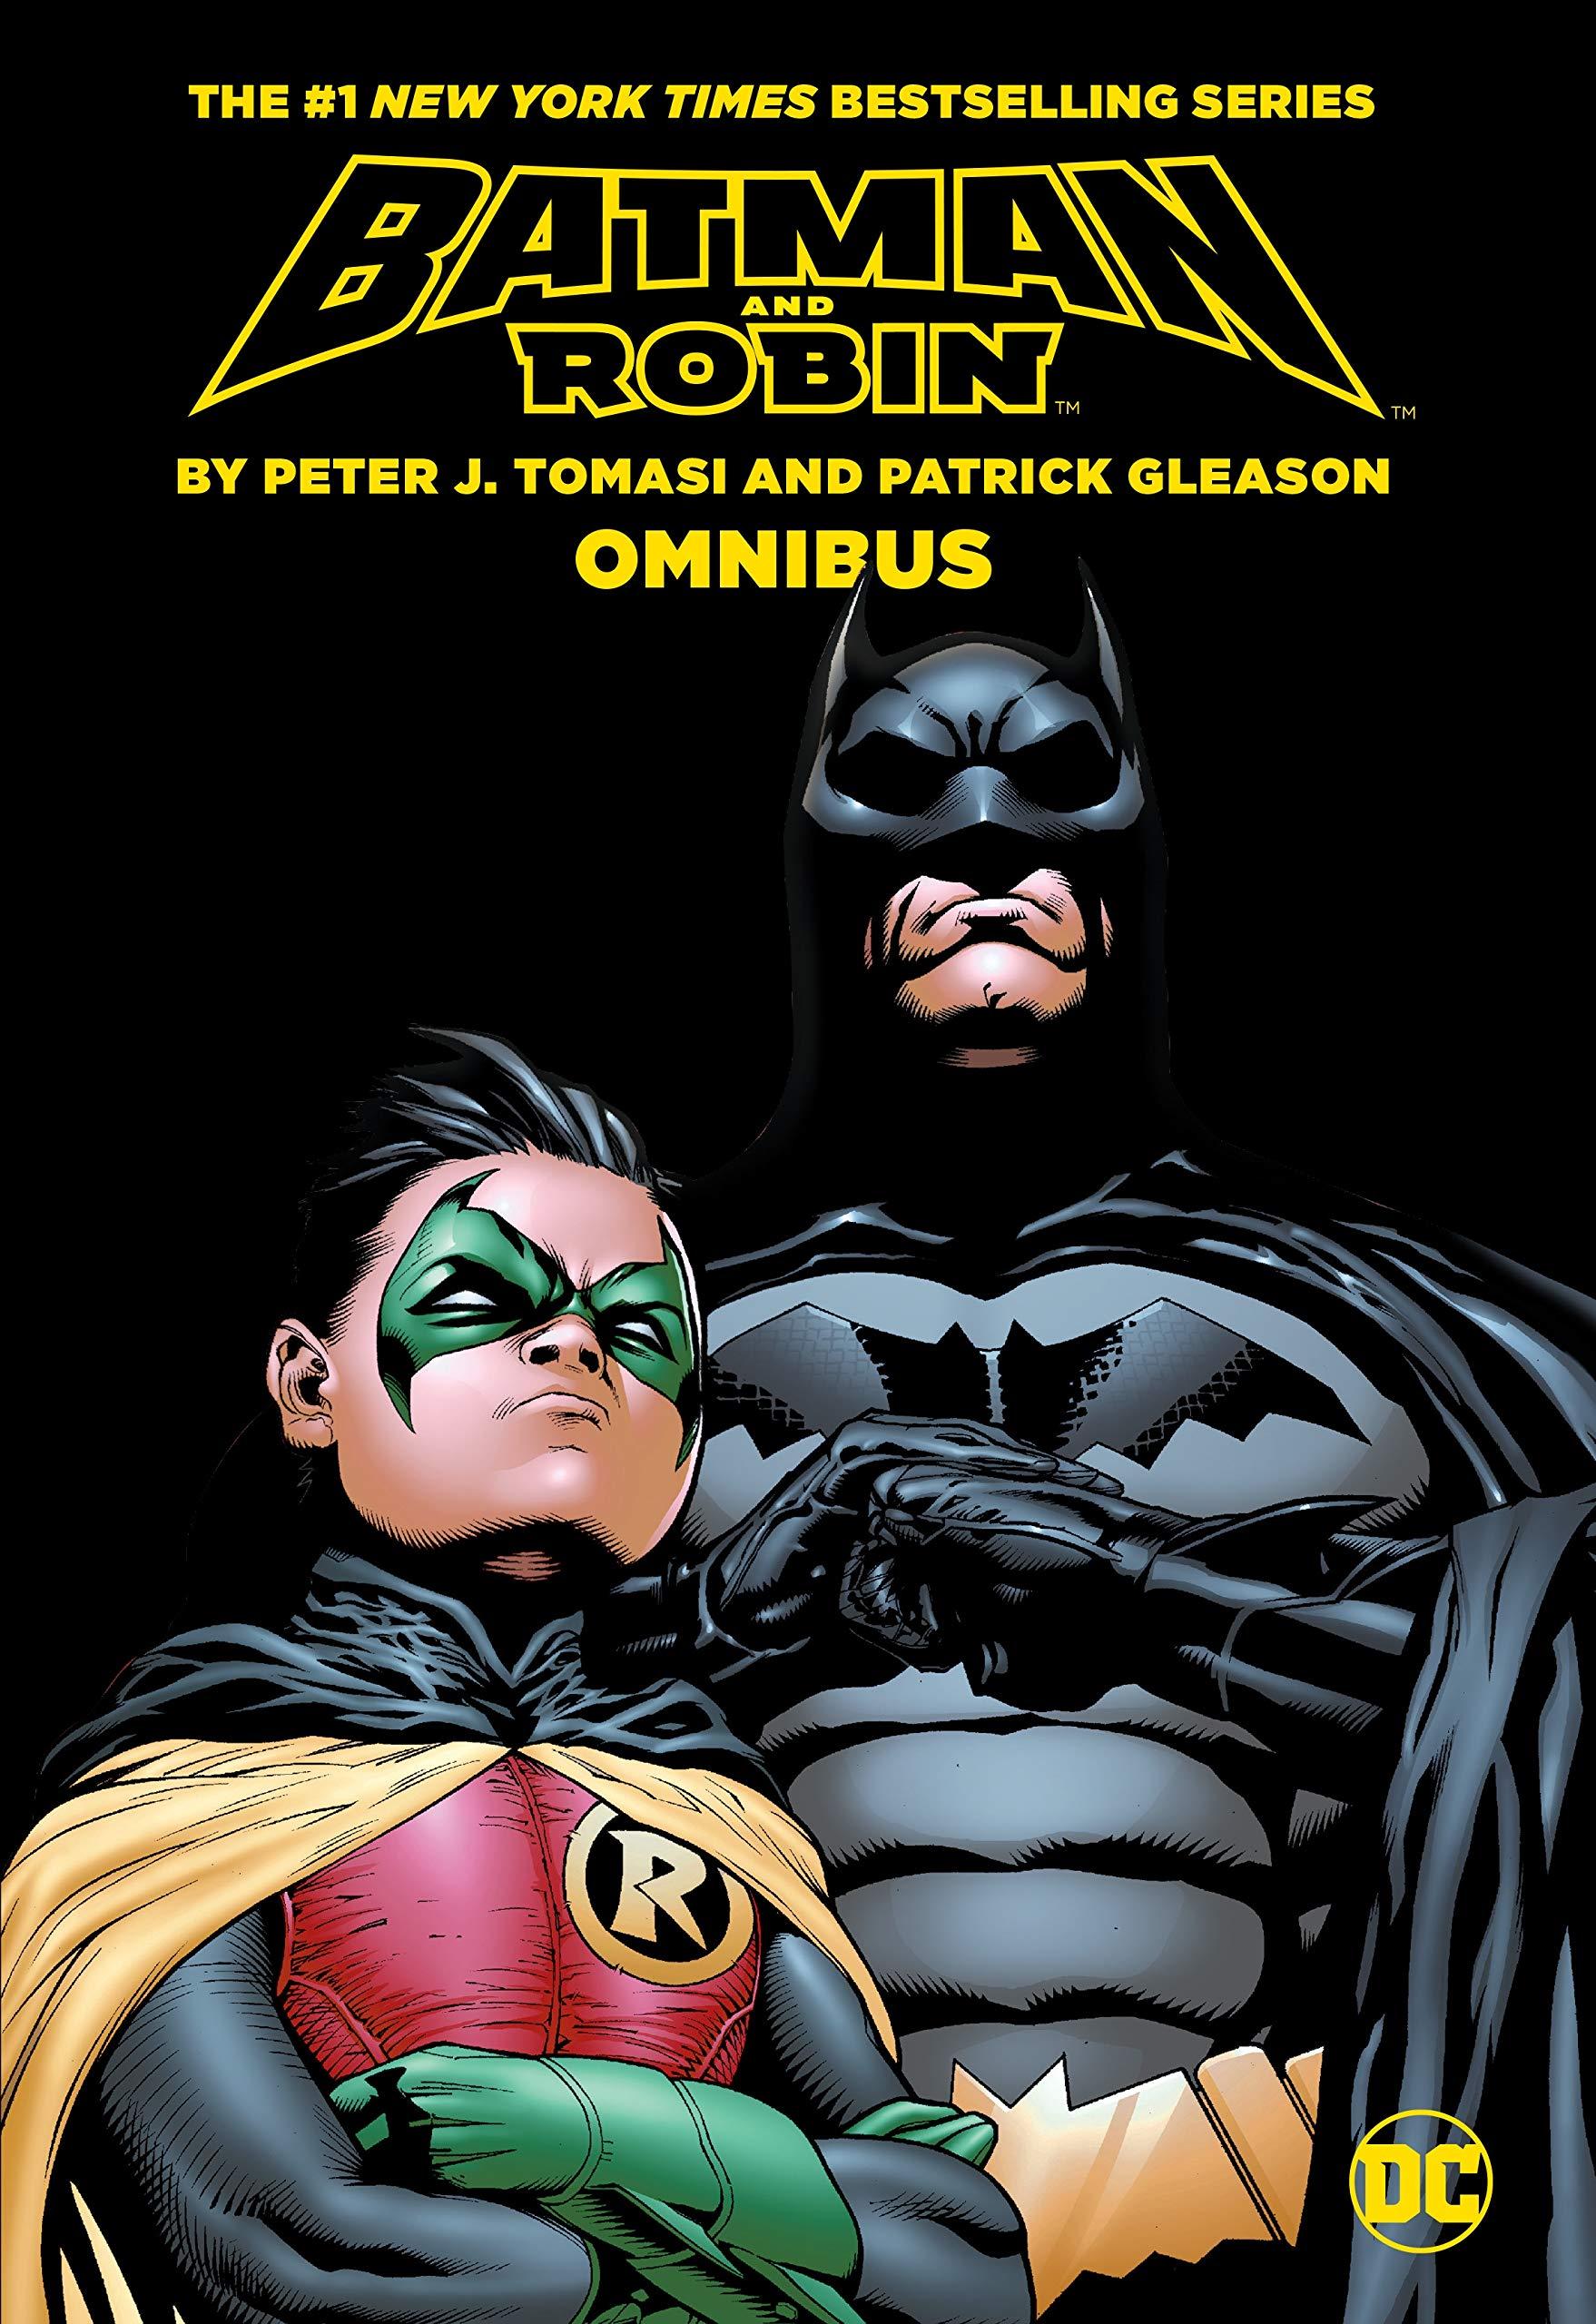 Amazon.com: Batman & Robin by Tomasi & Gleason Omnibus (Batman and ...